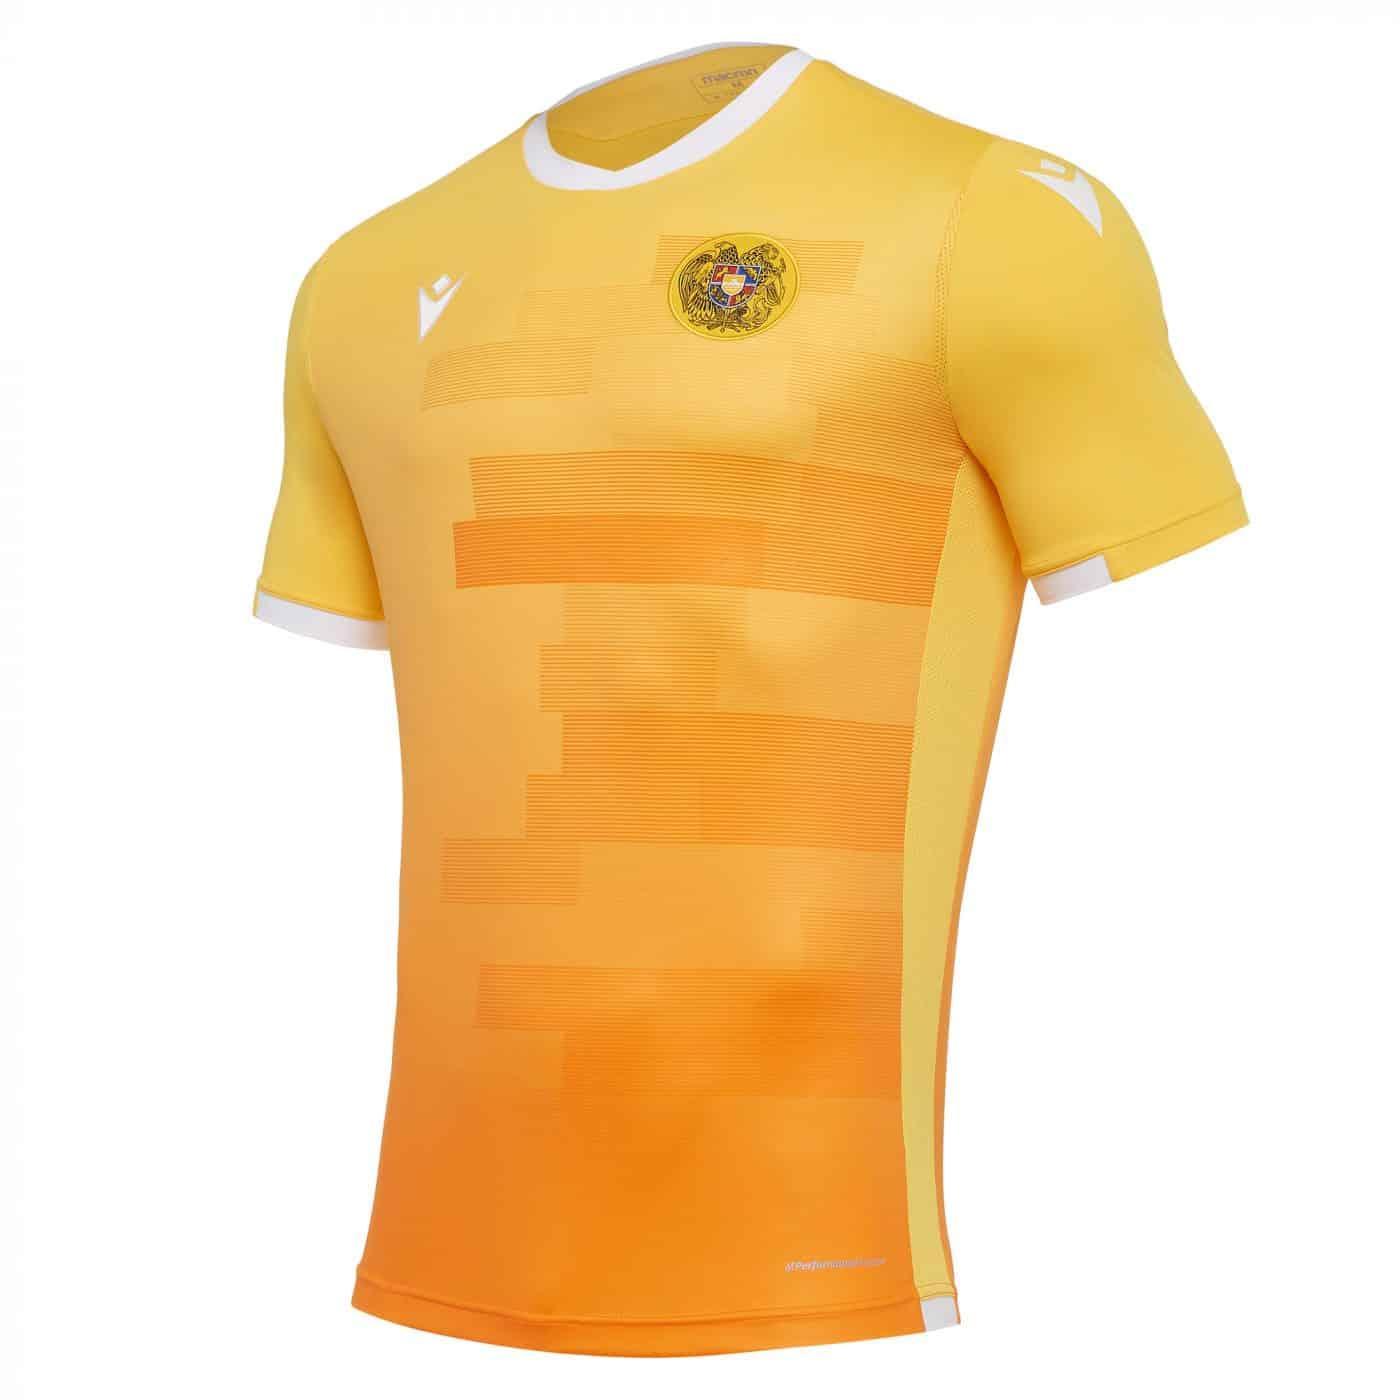 maillot-exterieur-armenie-2020-2021-macron-uefa-armenia-jersey-2020